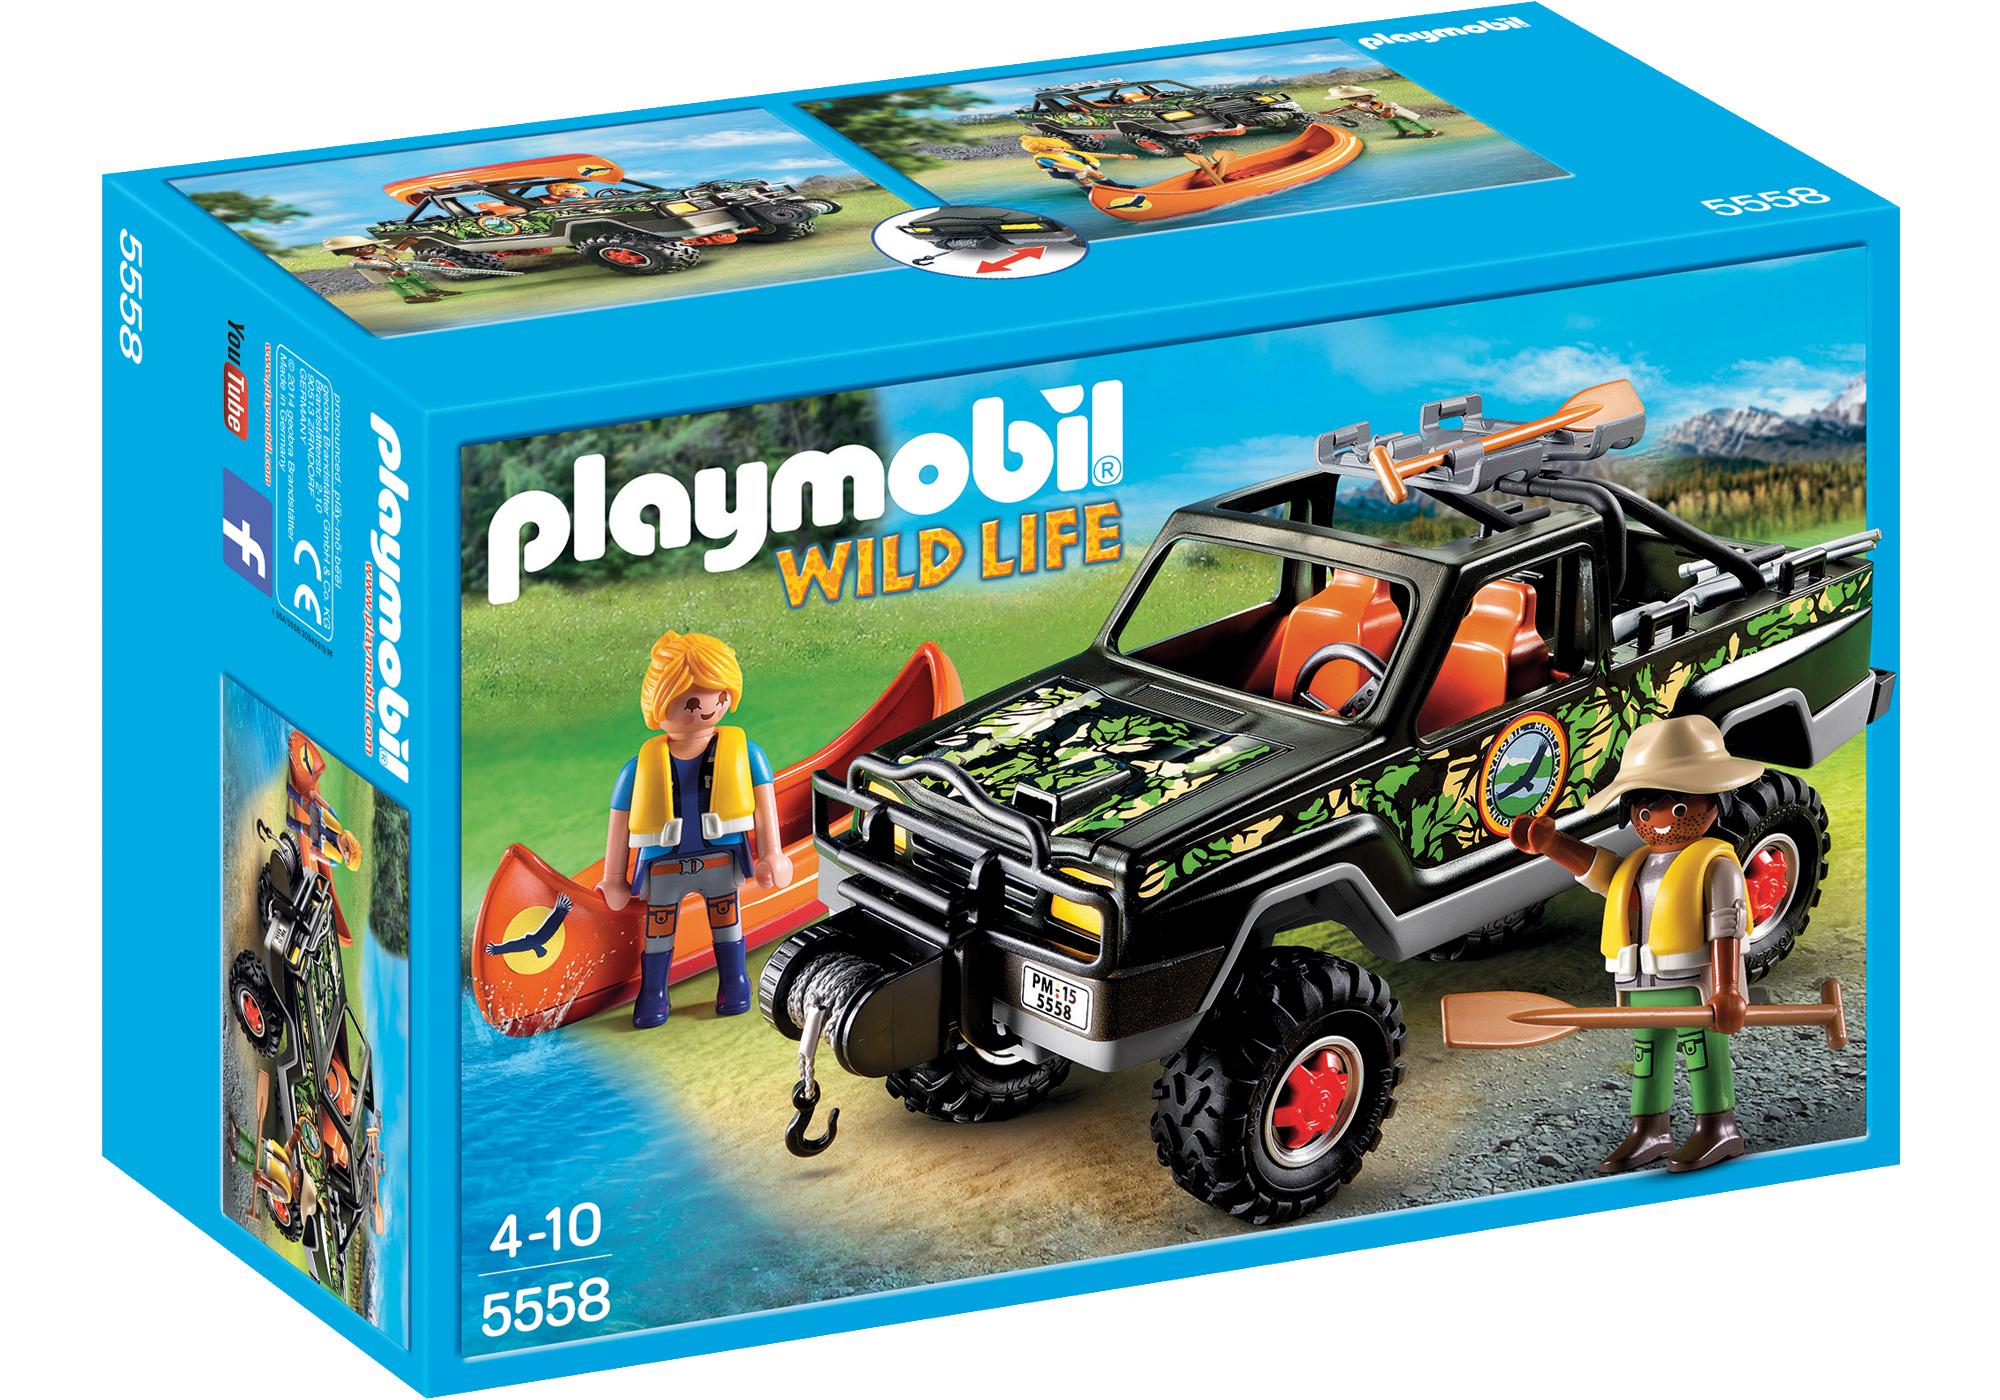 http://media.playmobil.com/i/playmobil/5558_product_box_front